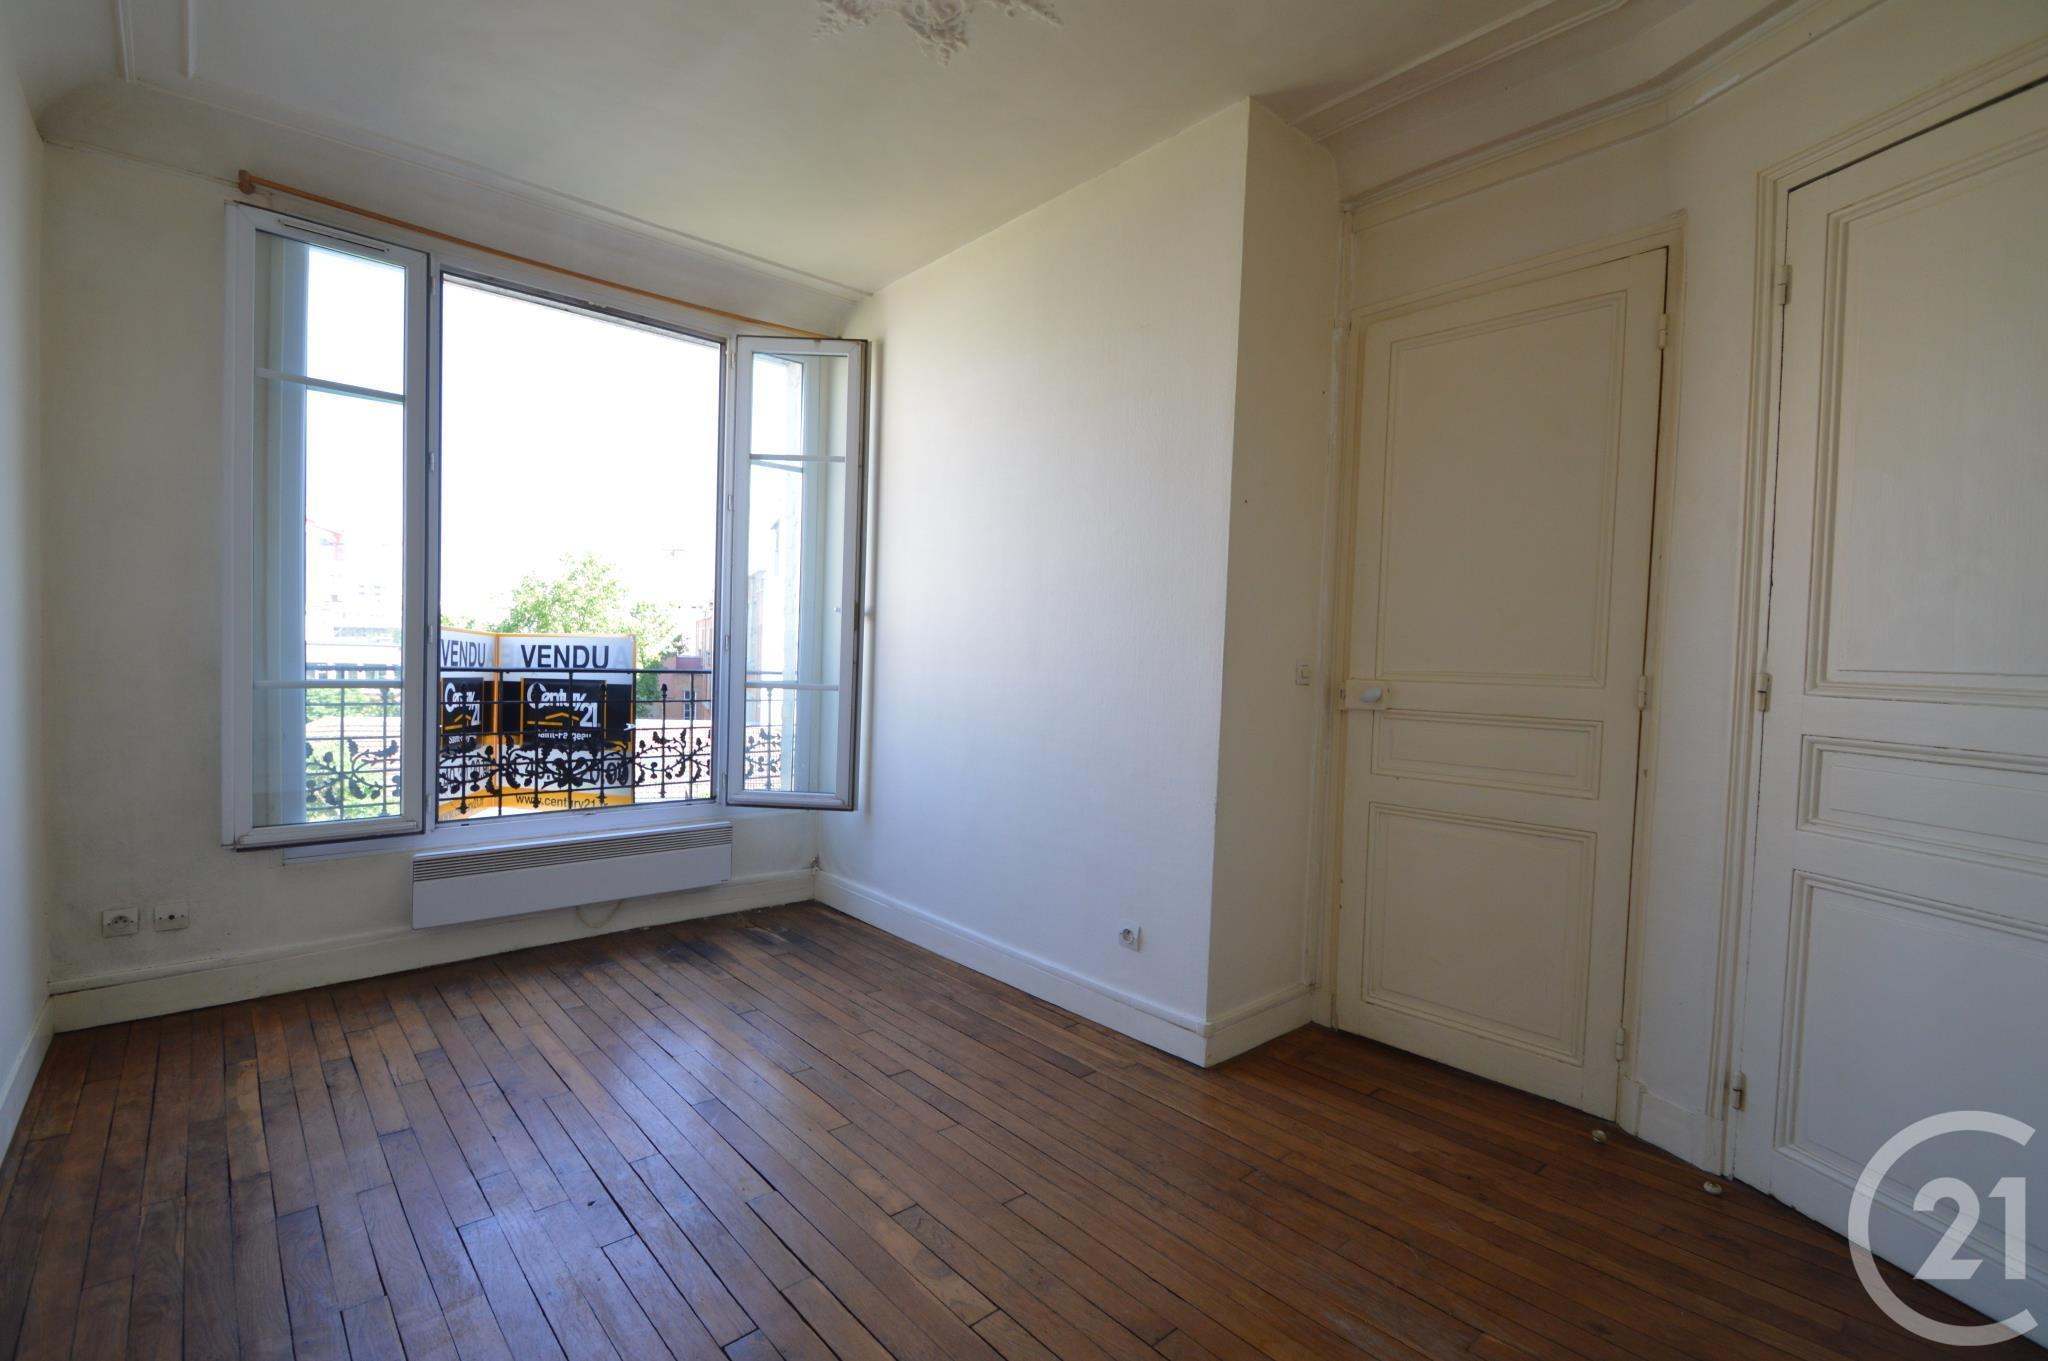 appartement f1 vendre 1 pi ce 19 m2 paris 75020. Black Bedroom Furniture Sets. Home Design Ideas